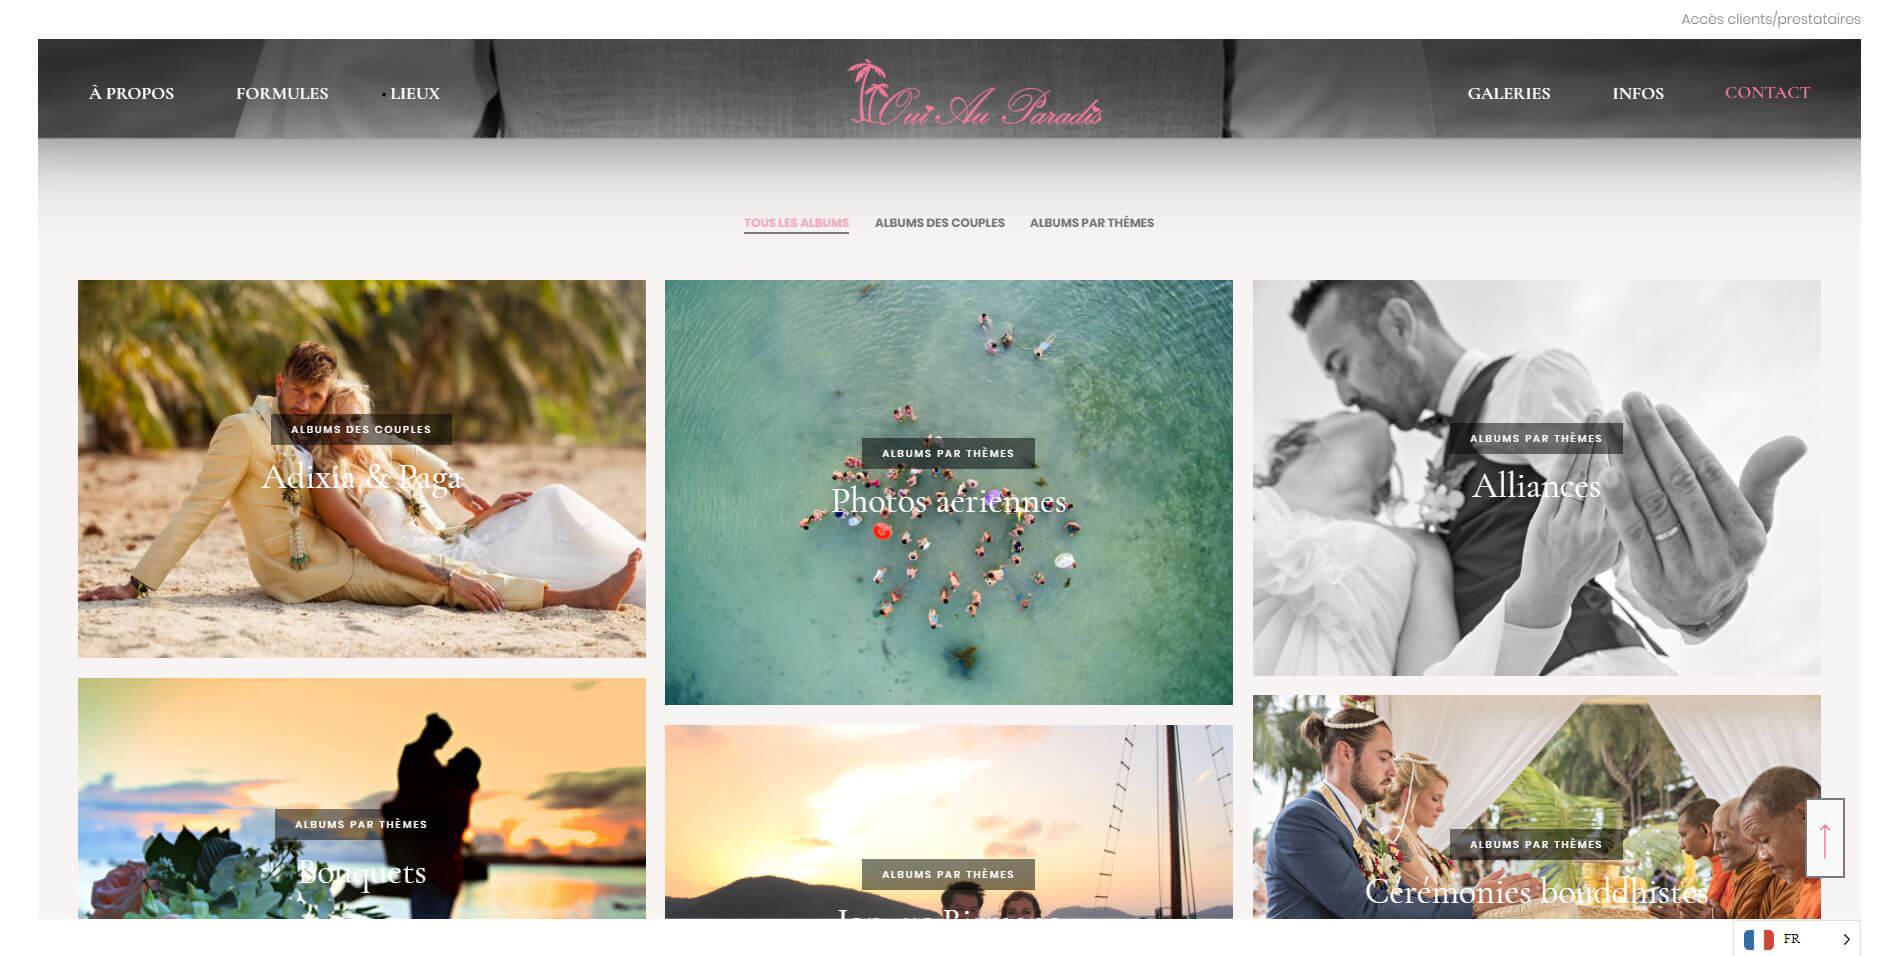 Website – Oui au paradis